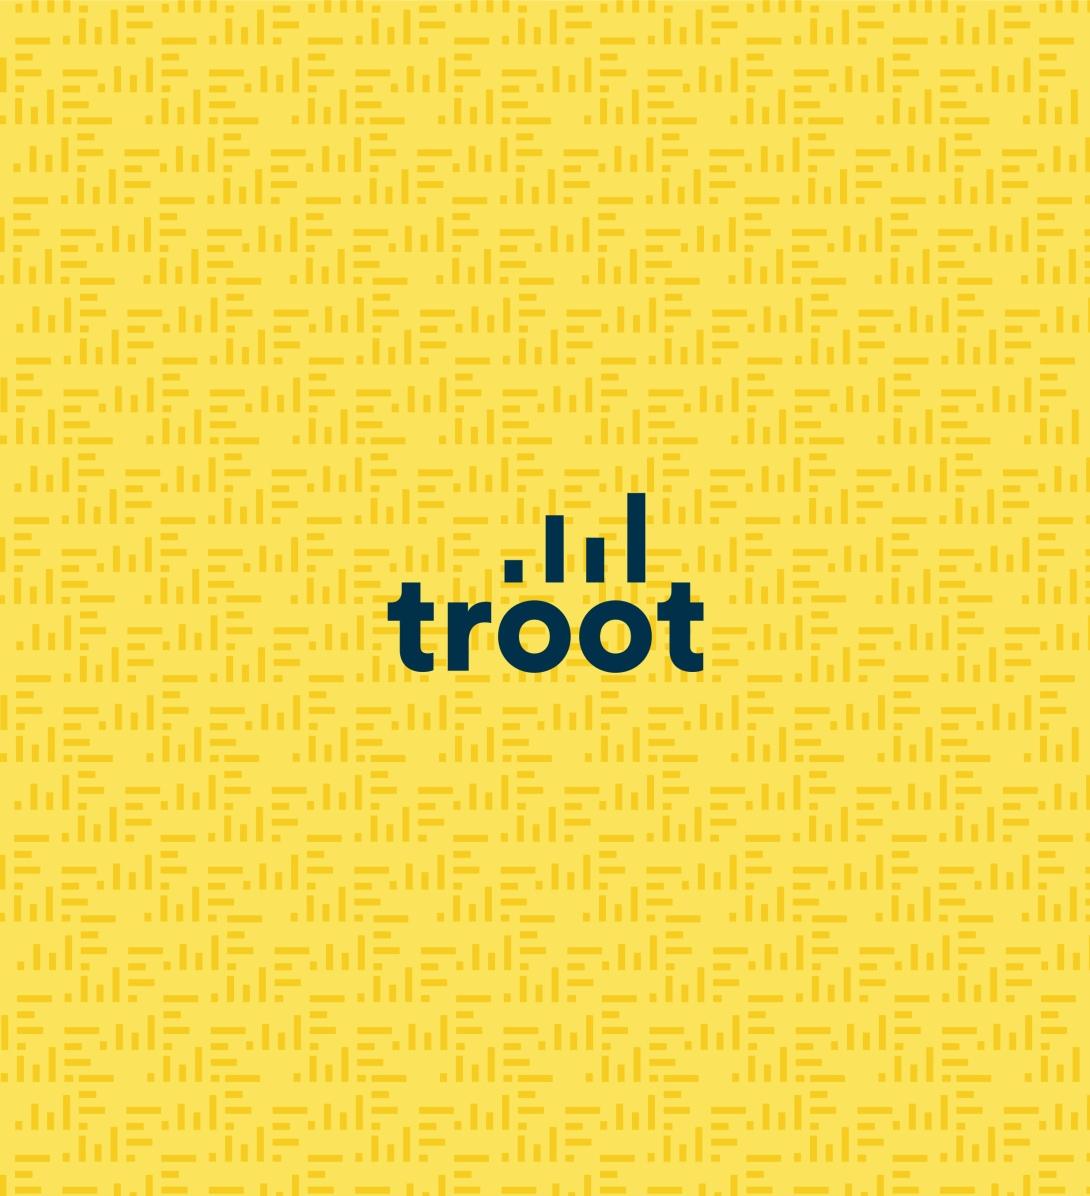 Troot_taustat-2